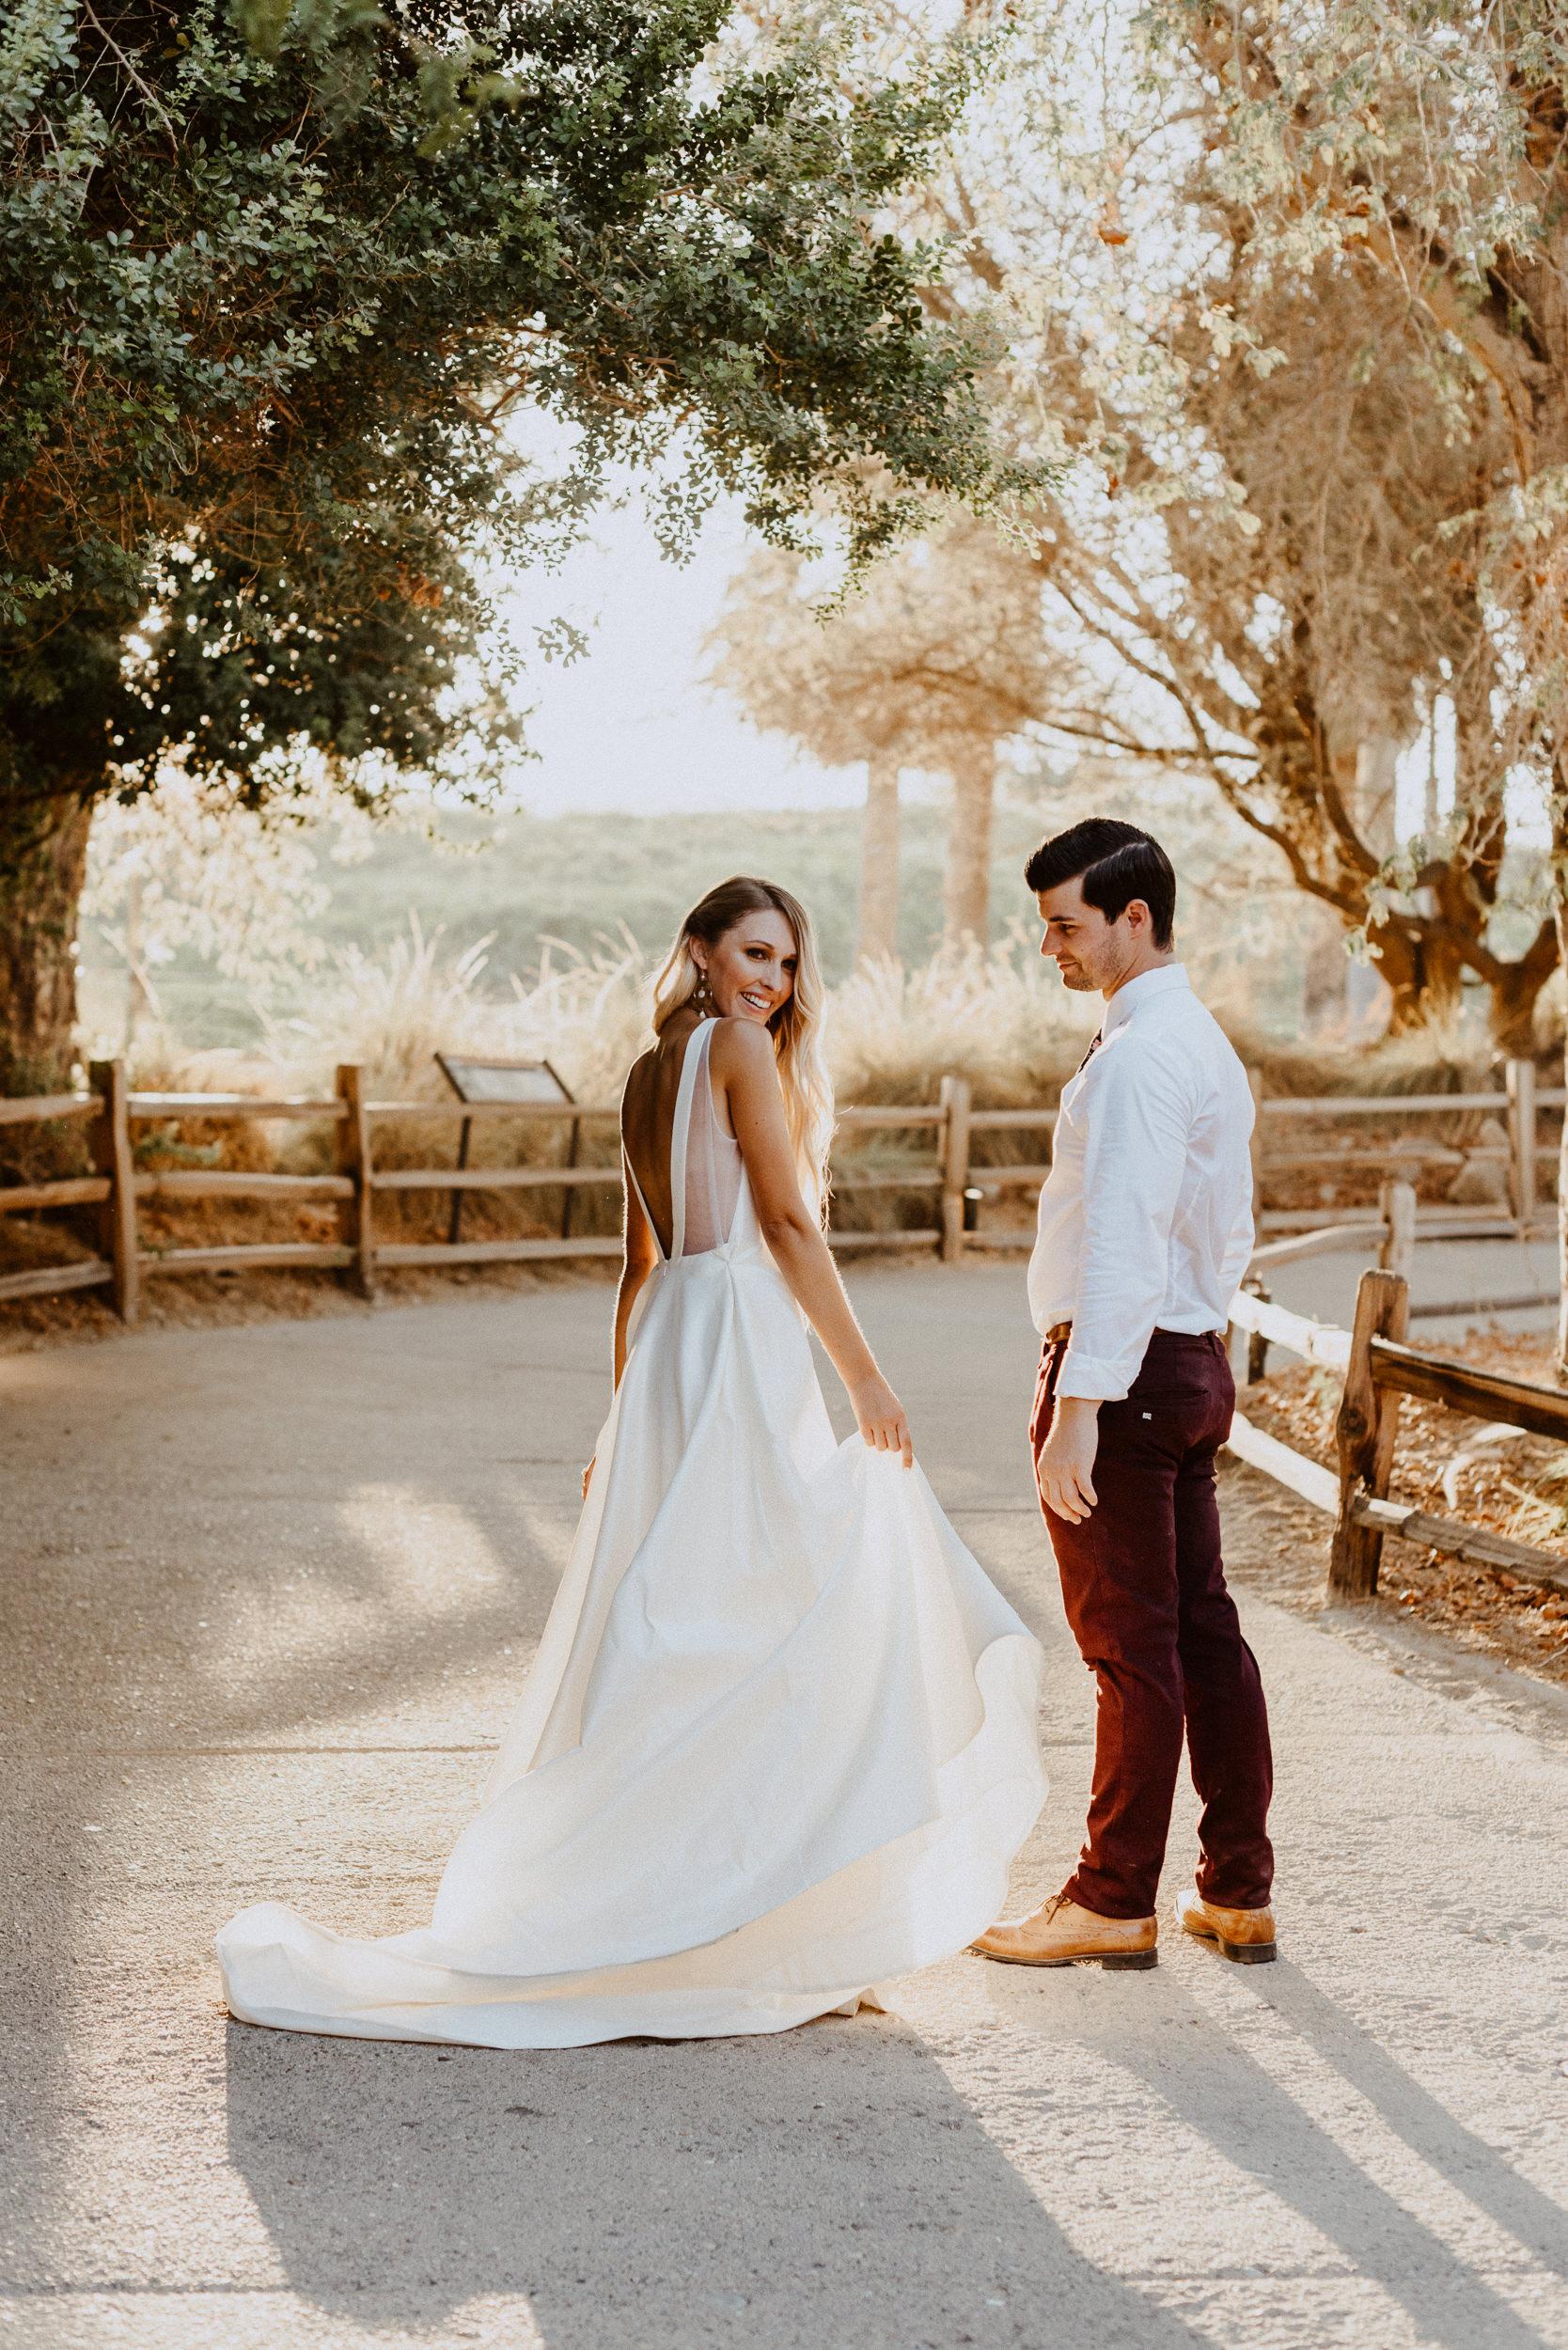 sChelsie + Chris - The Desert Shootout Wedding Romantics at The Living Desert-143.jpg